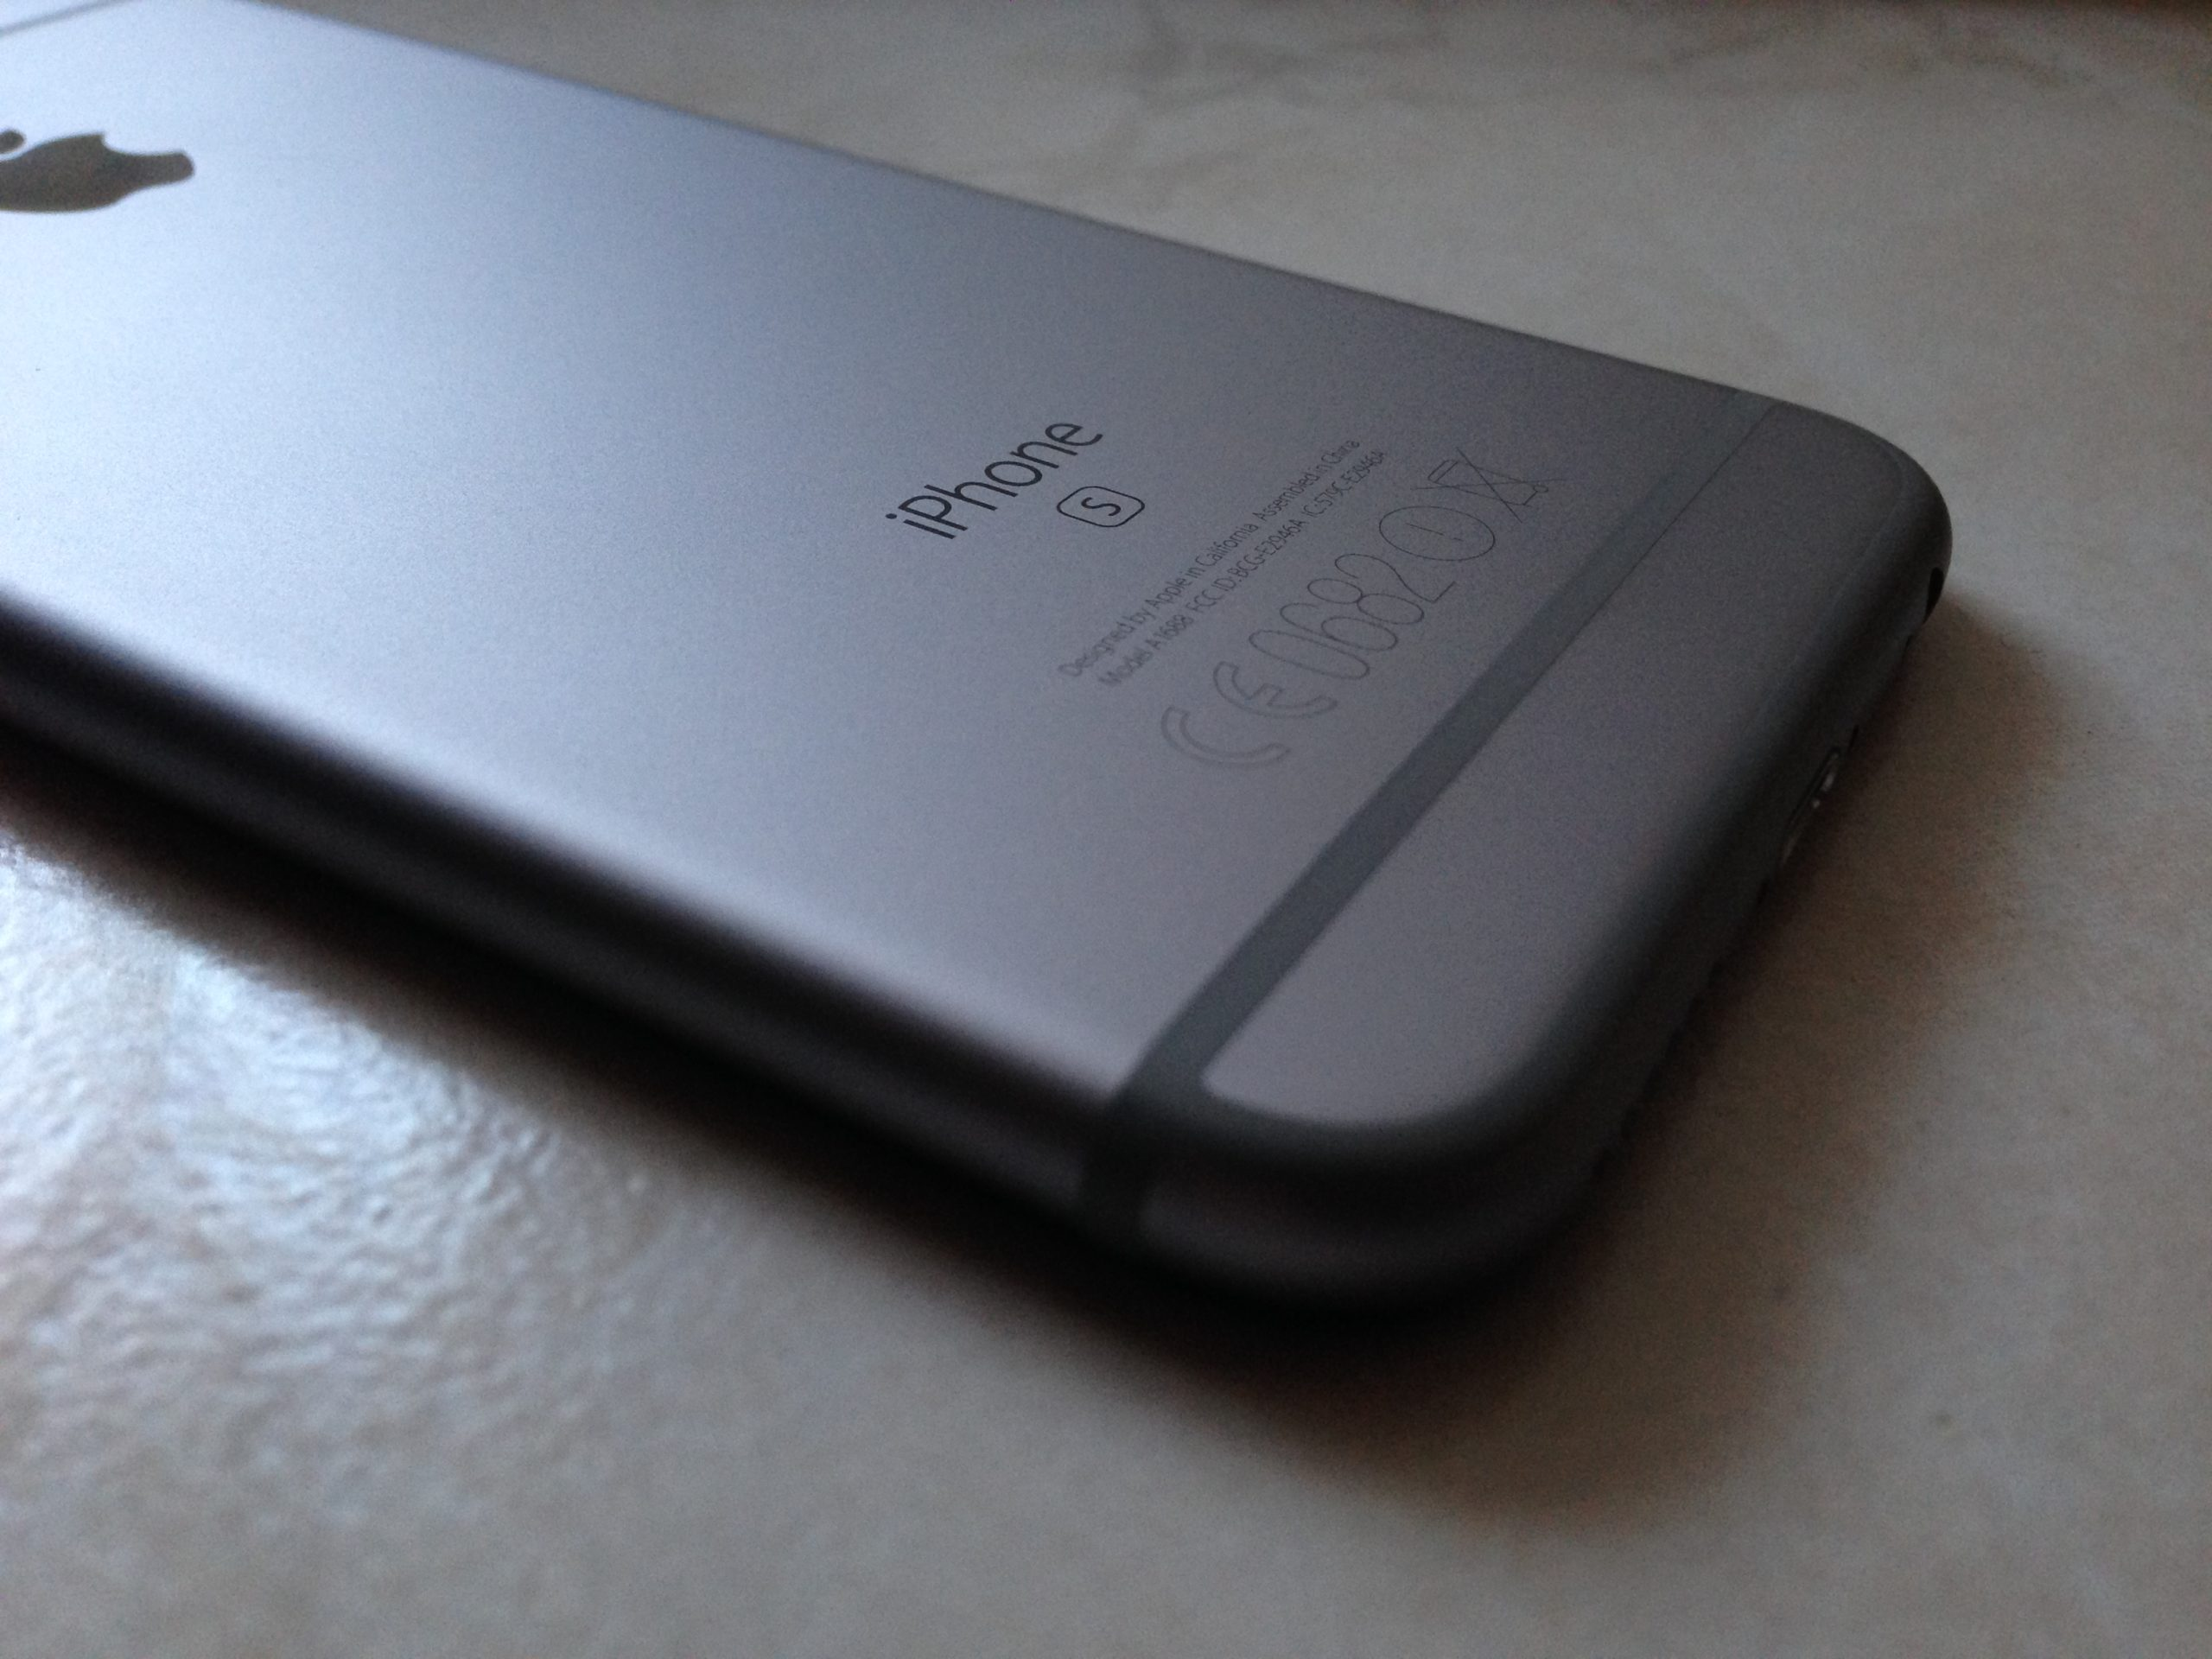 recenze iPhone 6s